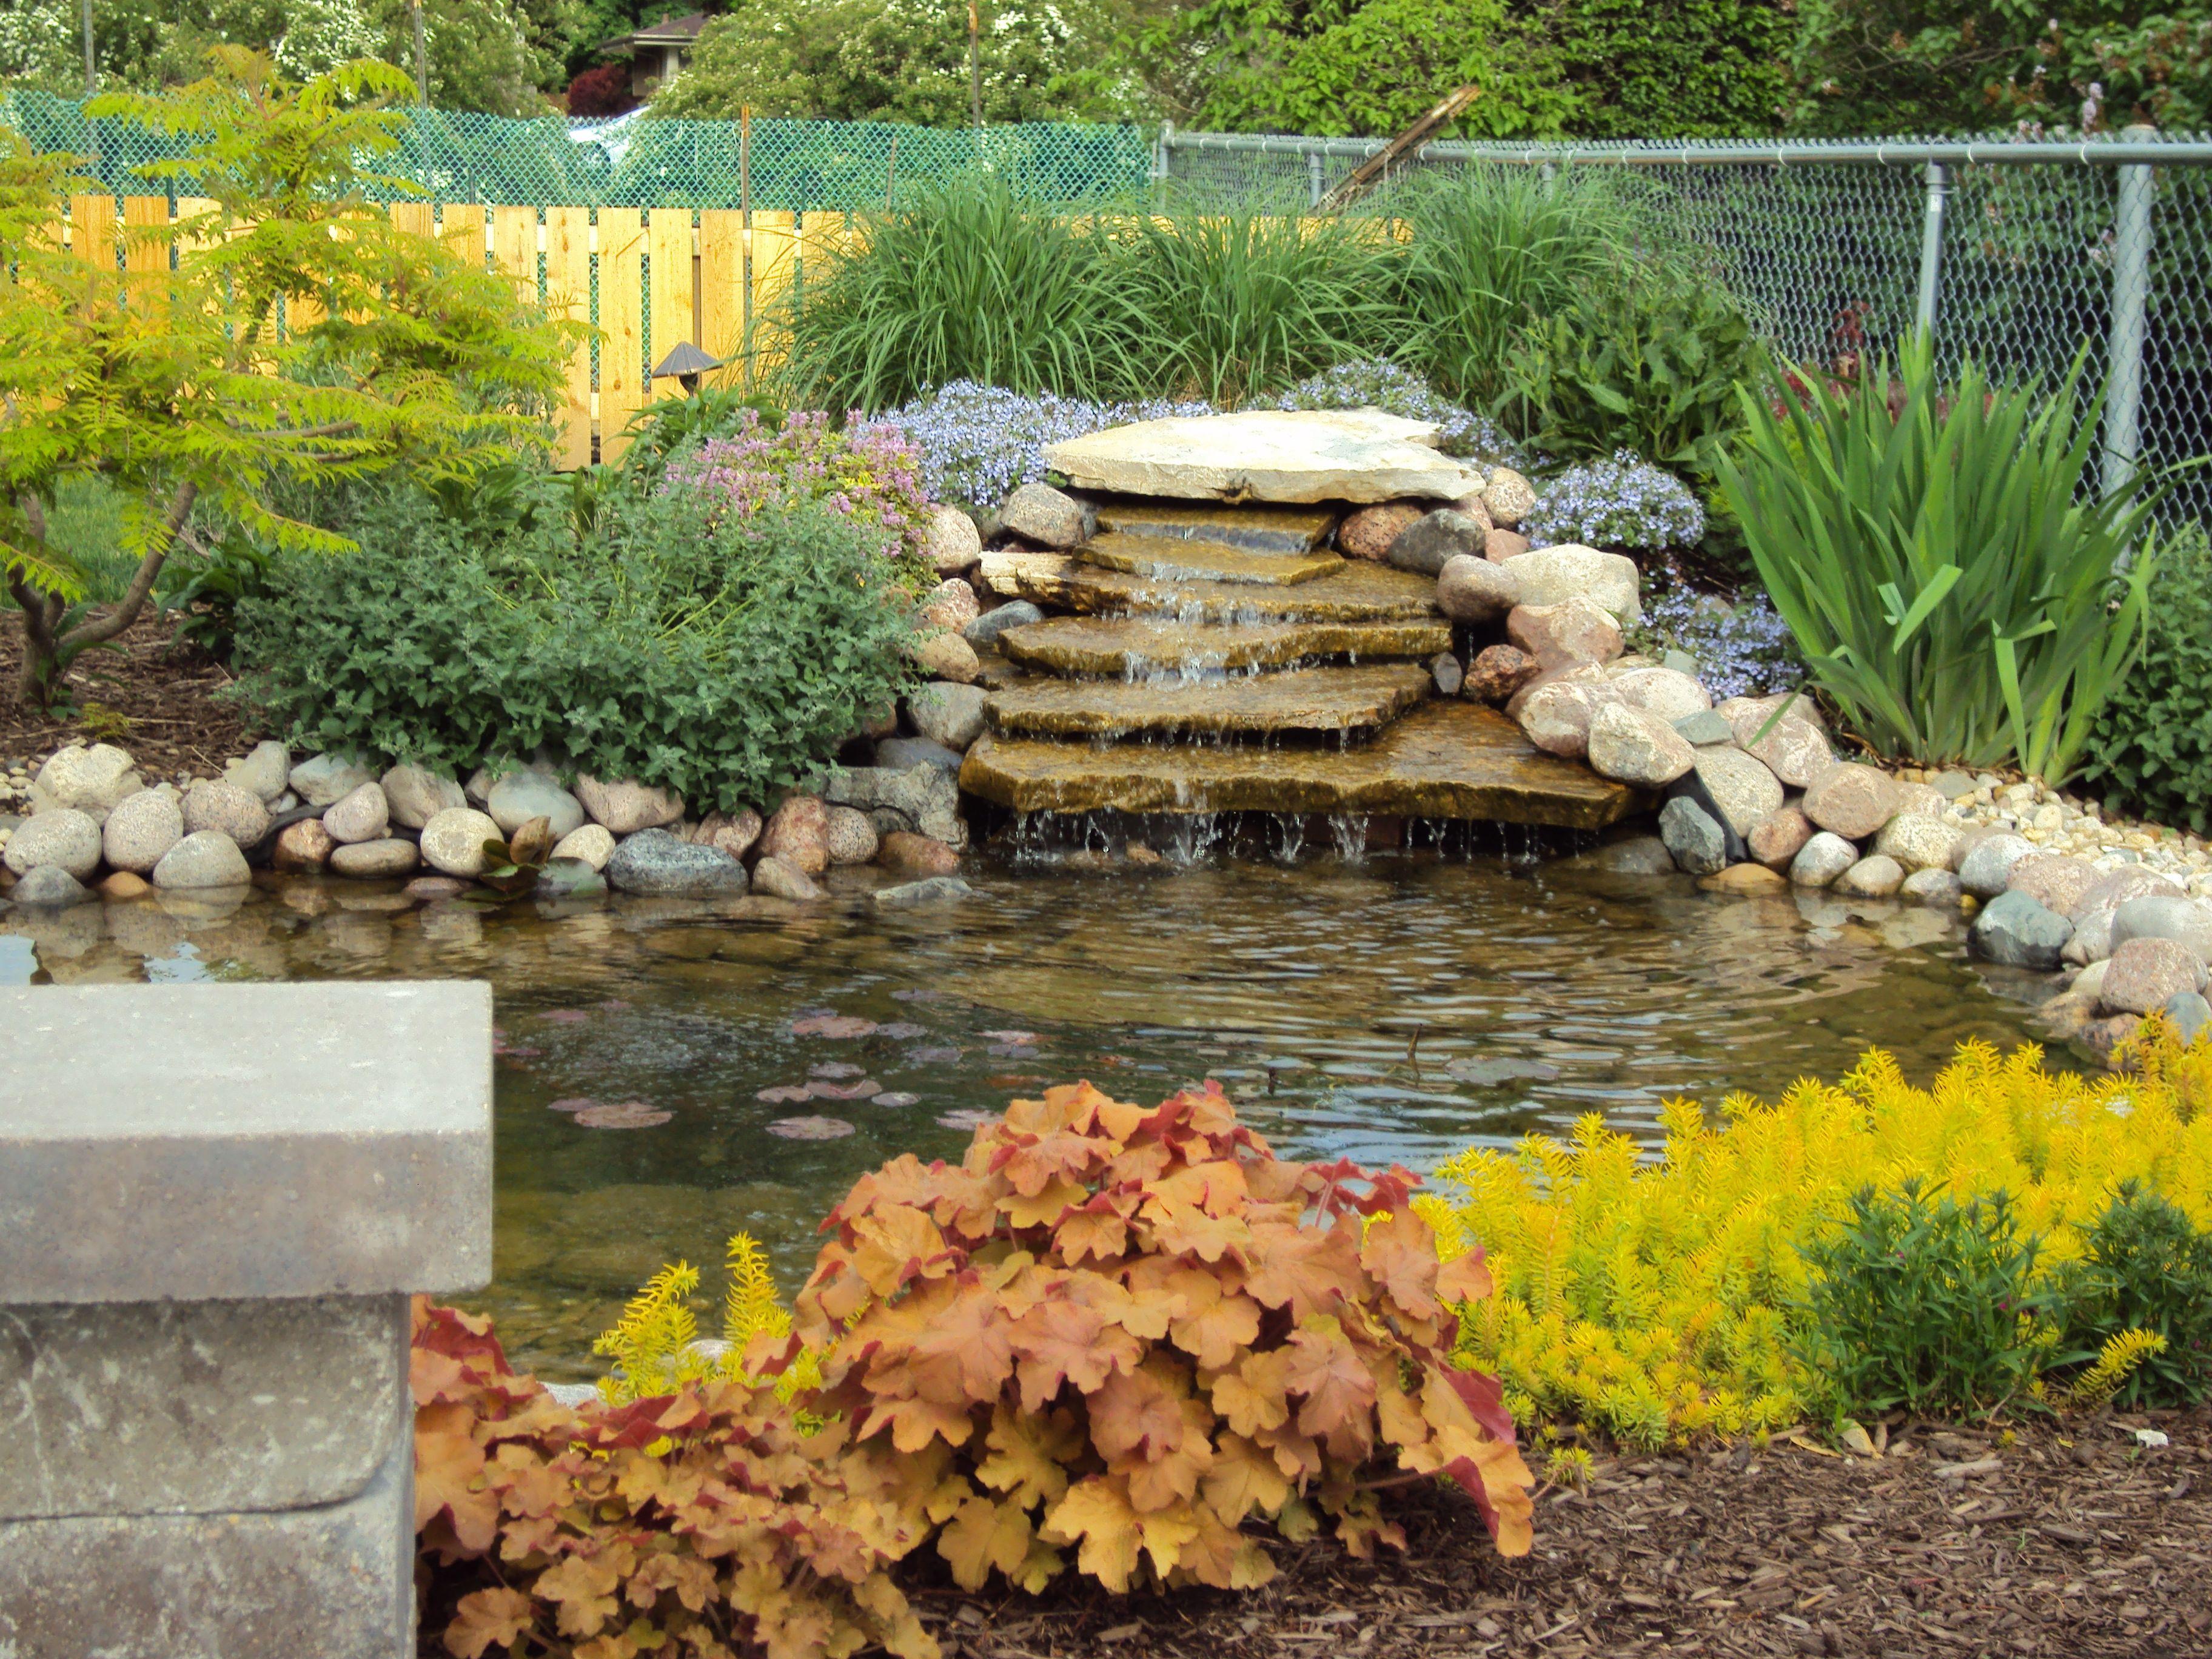 Backyard Ponds | Tips For Building A Backyard Pond